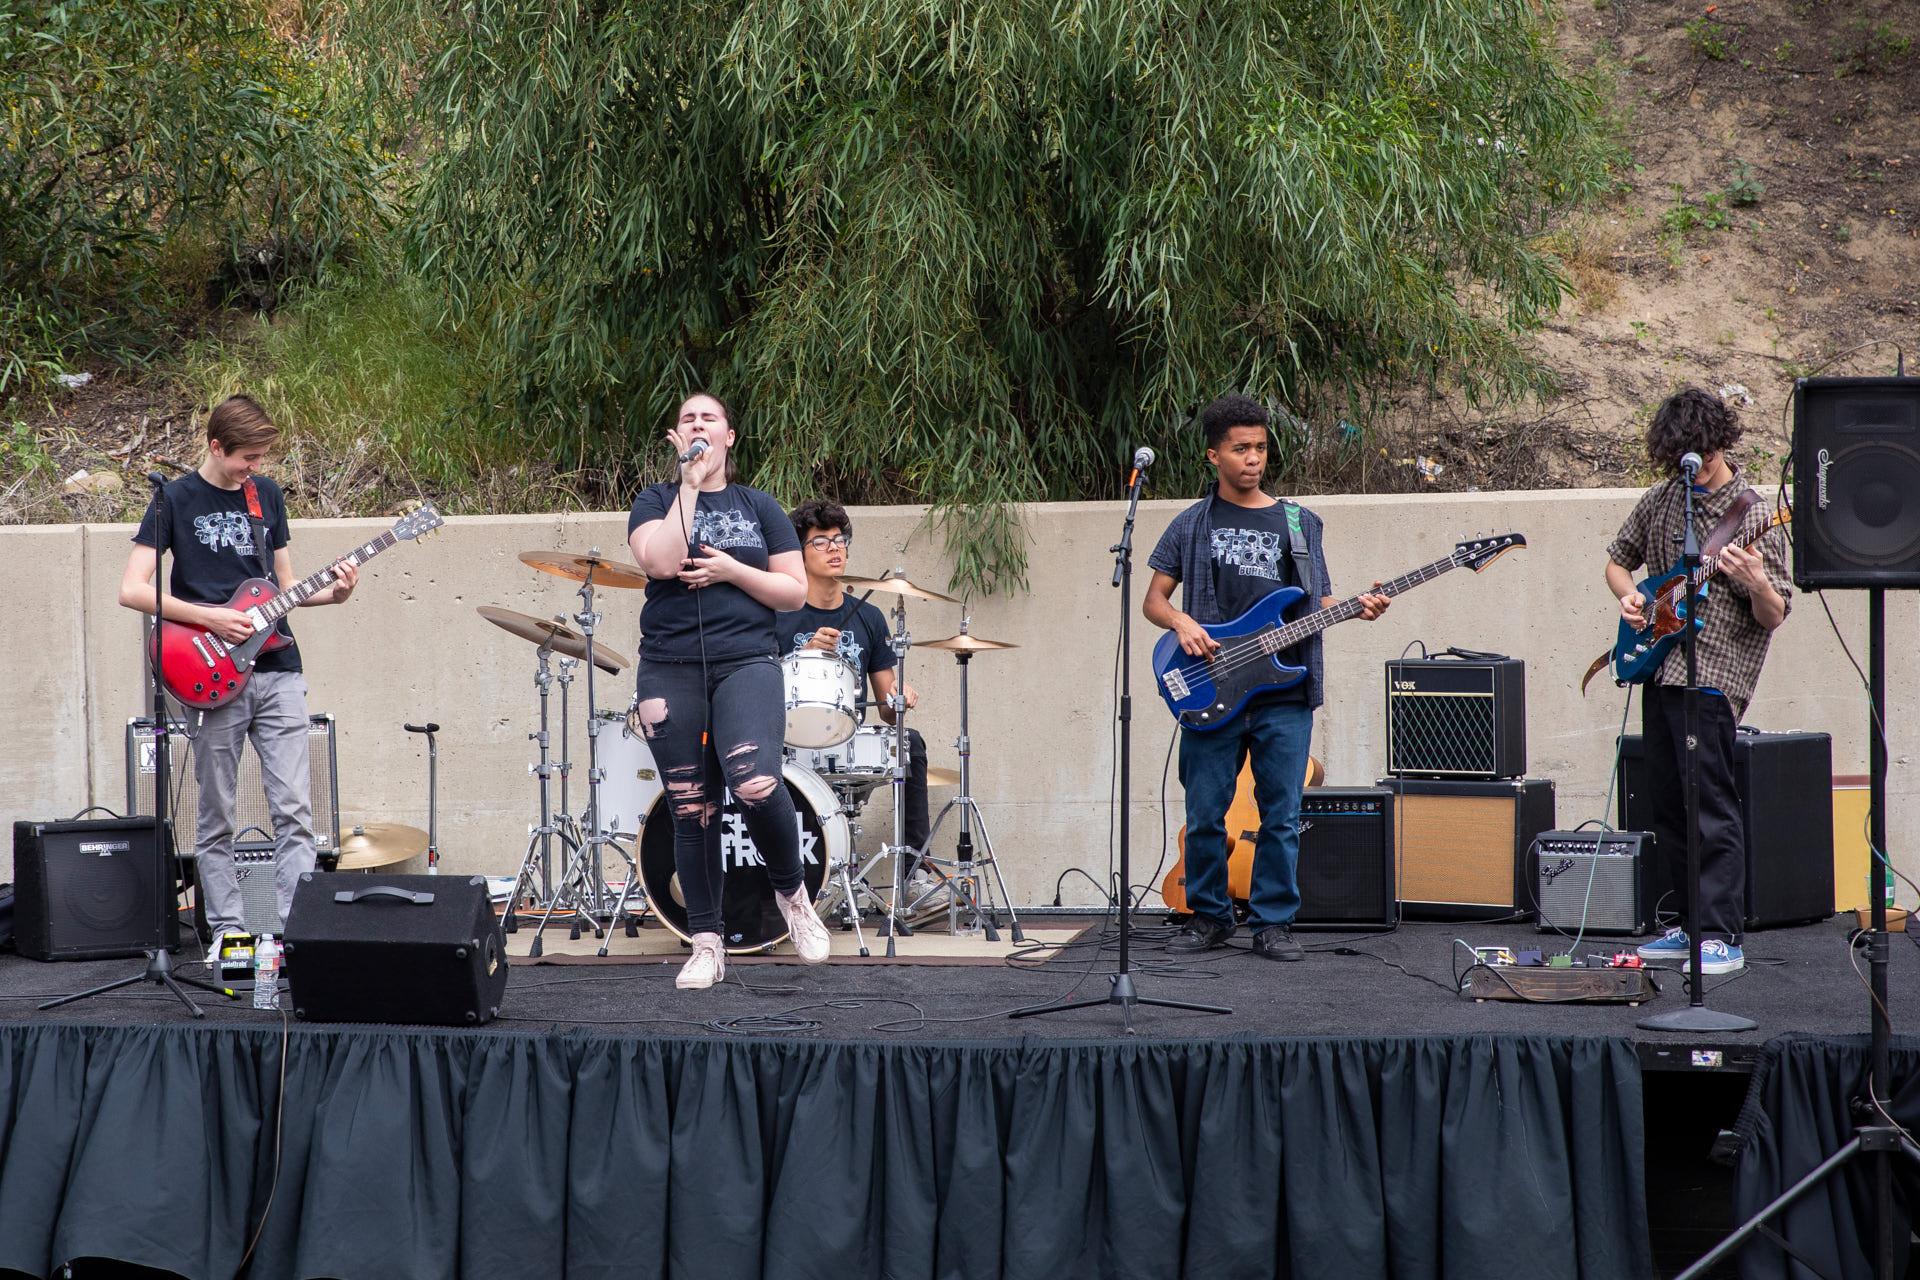 school-of-rock-teaches-the-universal-language-of-music-2